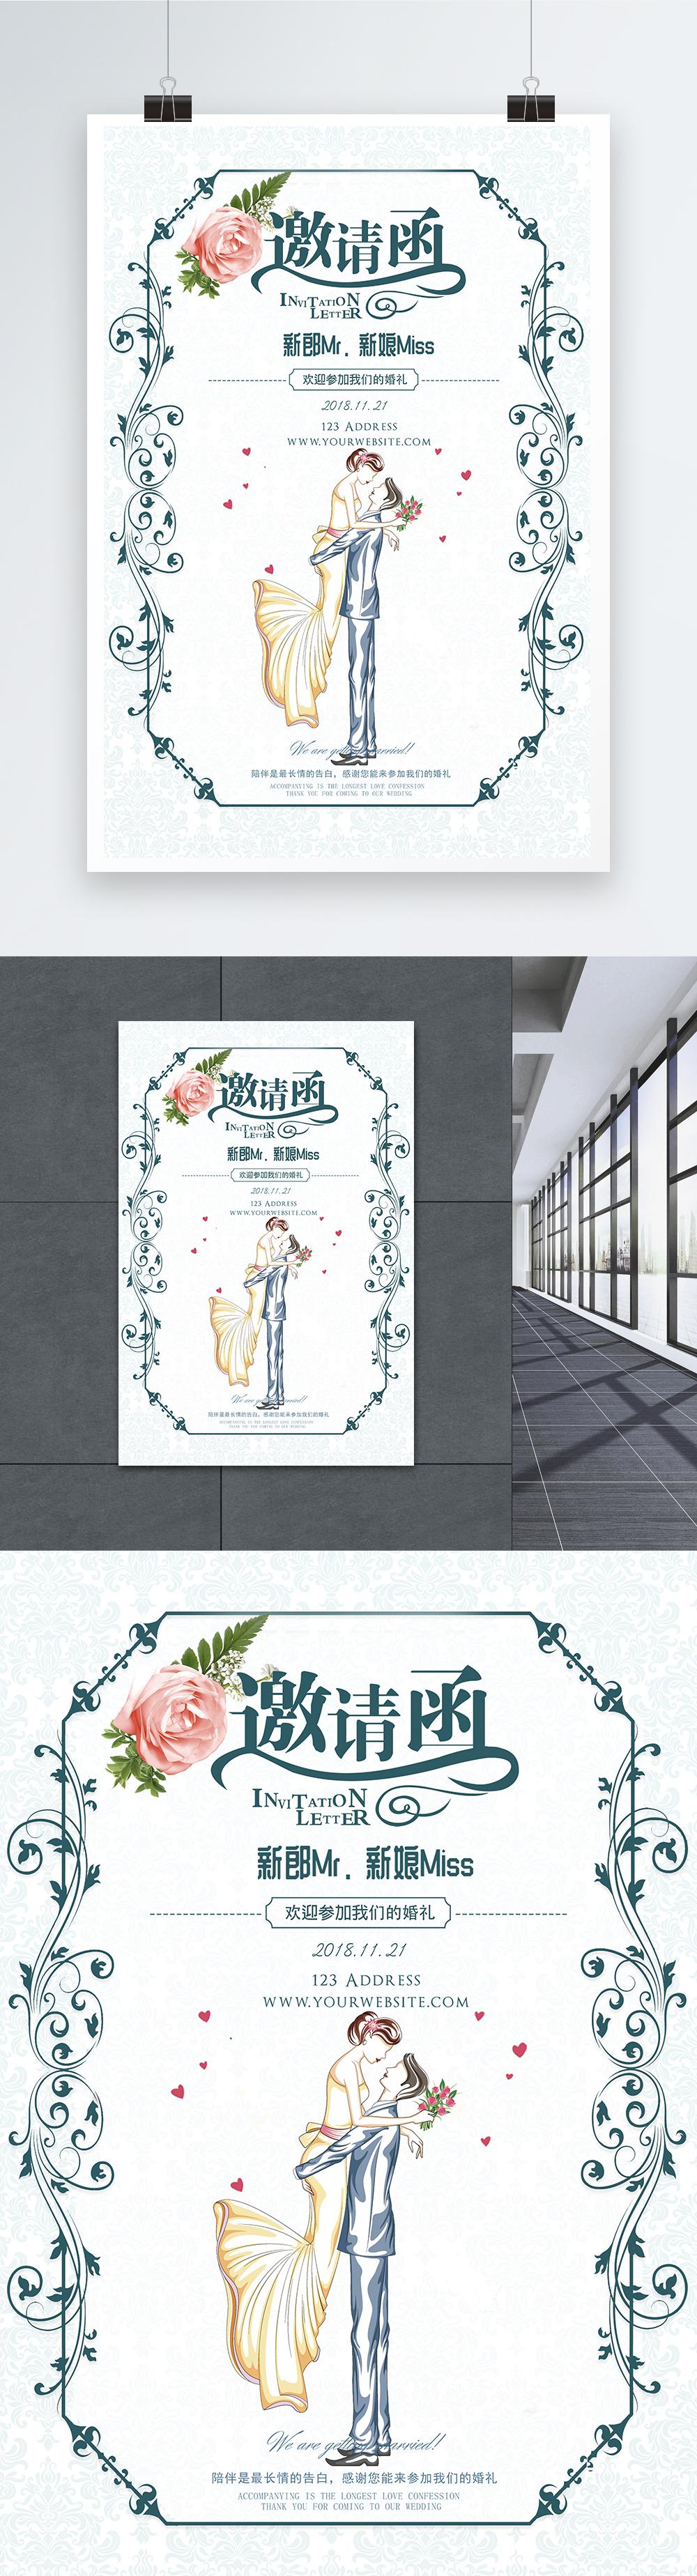 Wedding Wedding Invitation Background Design Psd Images Hd Psd Poster Backgrounds 605651627 Lovepik Com